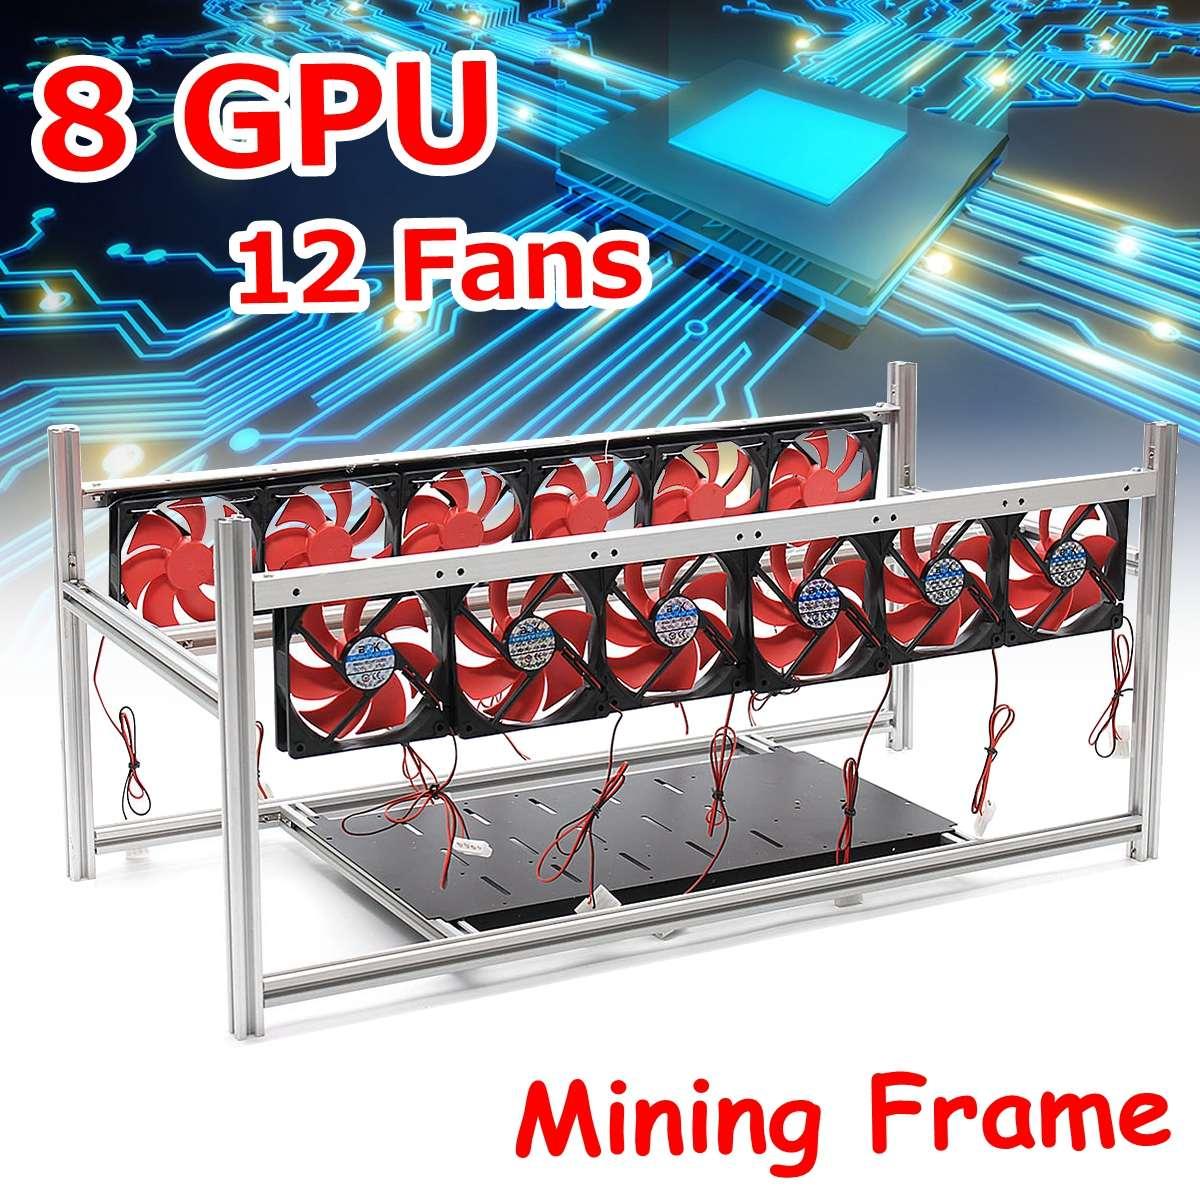 8 GPU Bergbau Rahmen Mit 12 LED Fans Aluminium Stapelbare Box ...